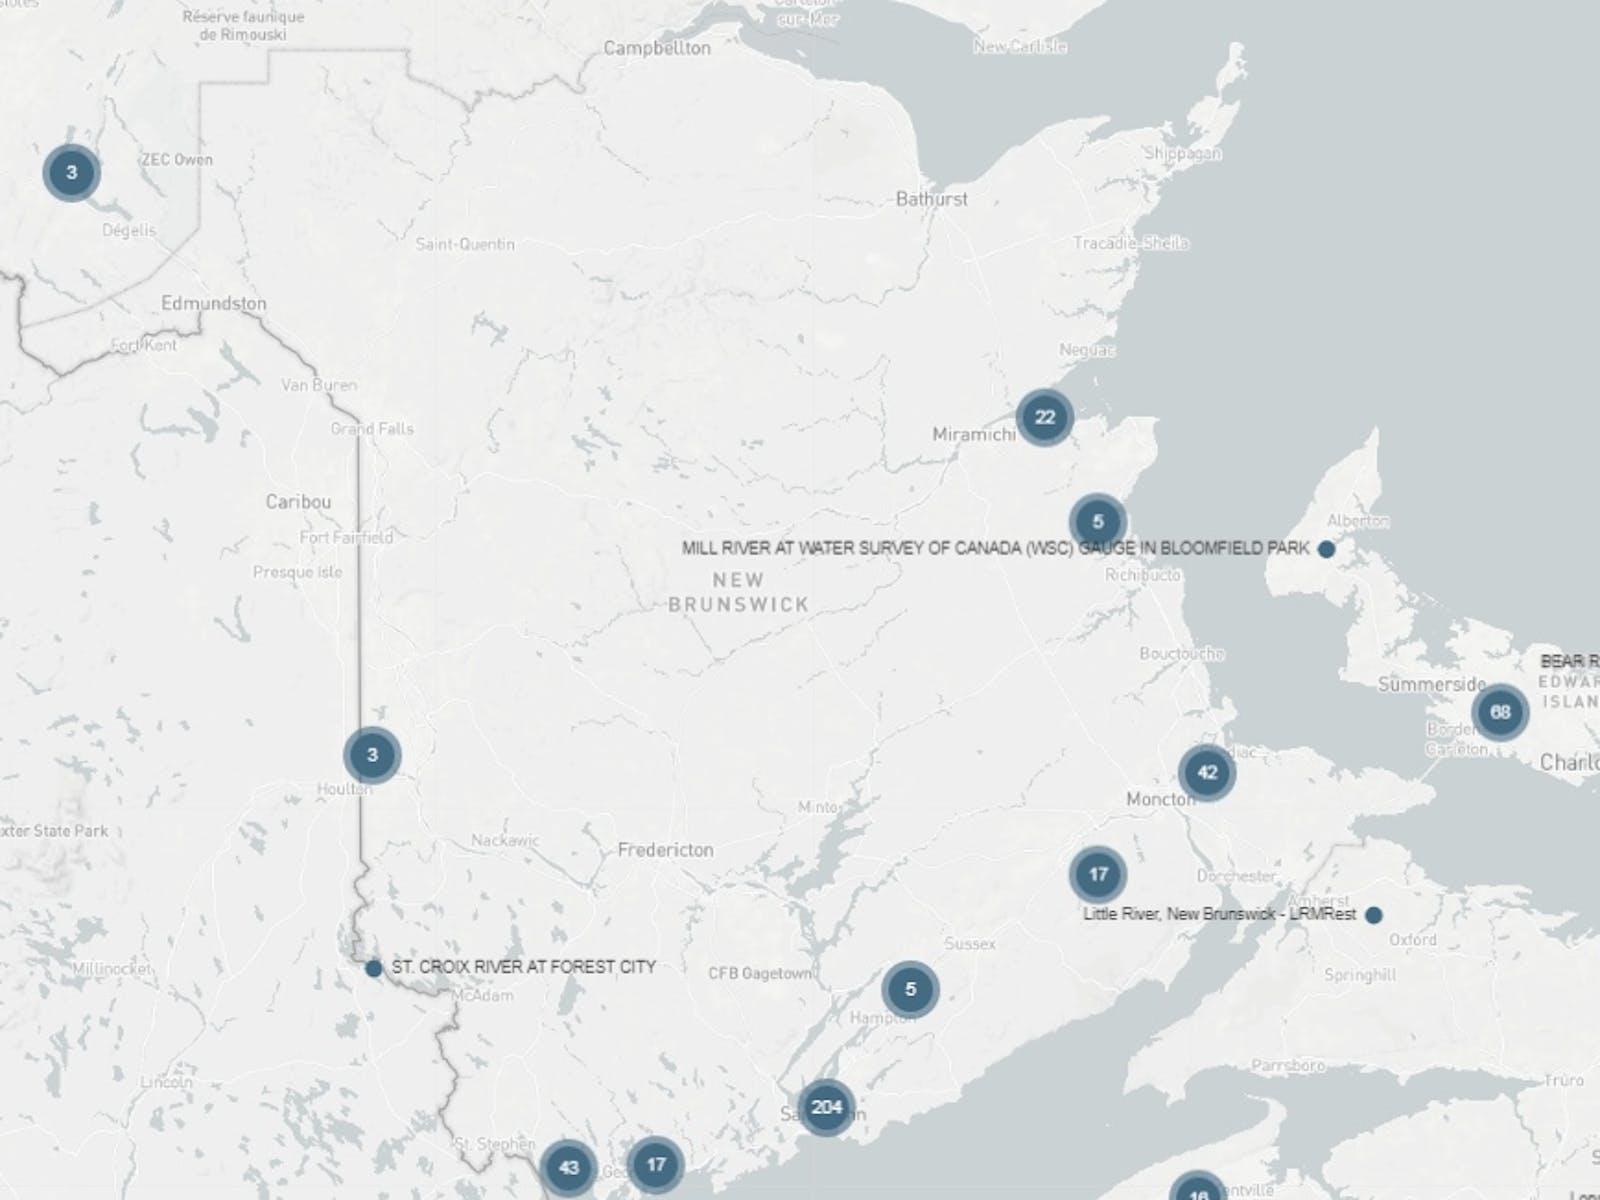 Screenshot of locations in Atlantic DataStream